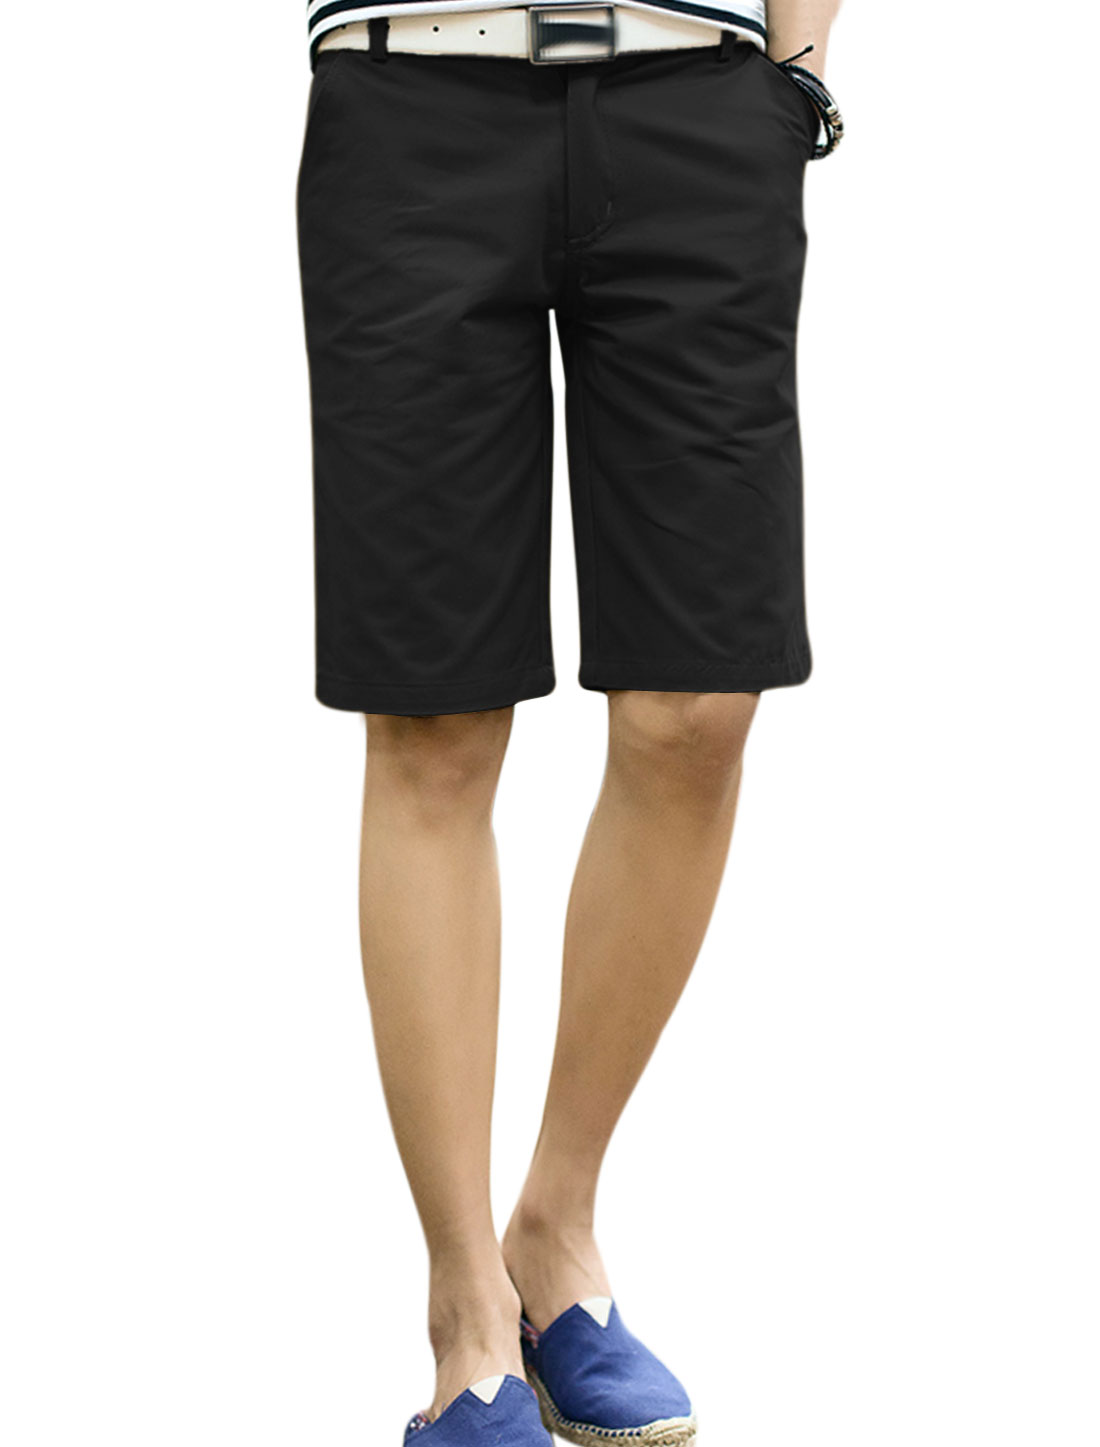 Men Belt Loop Zip Fly Four Pockets Stylish Shorts Black W34